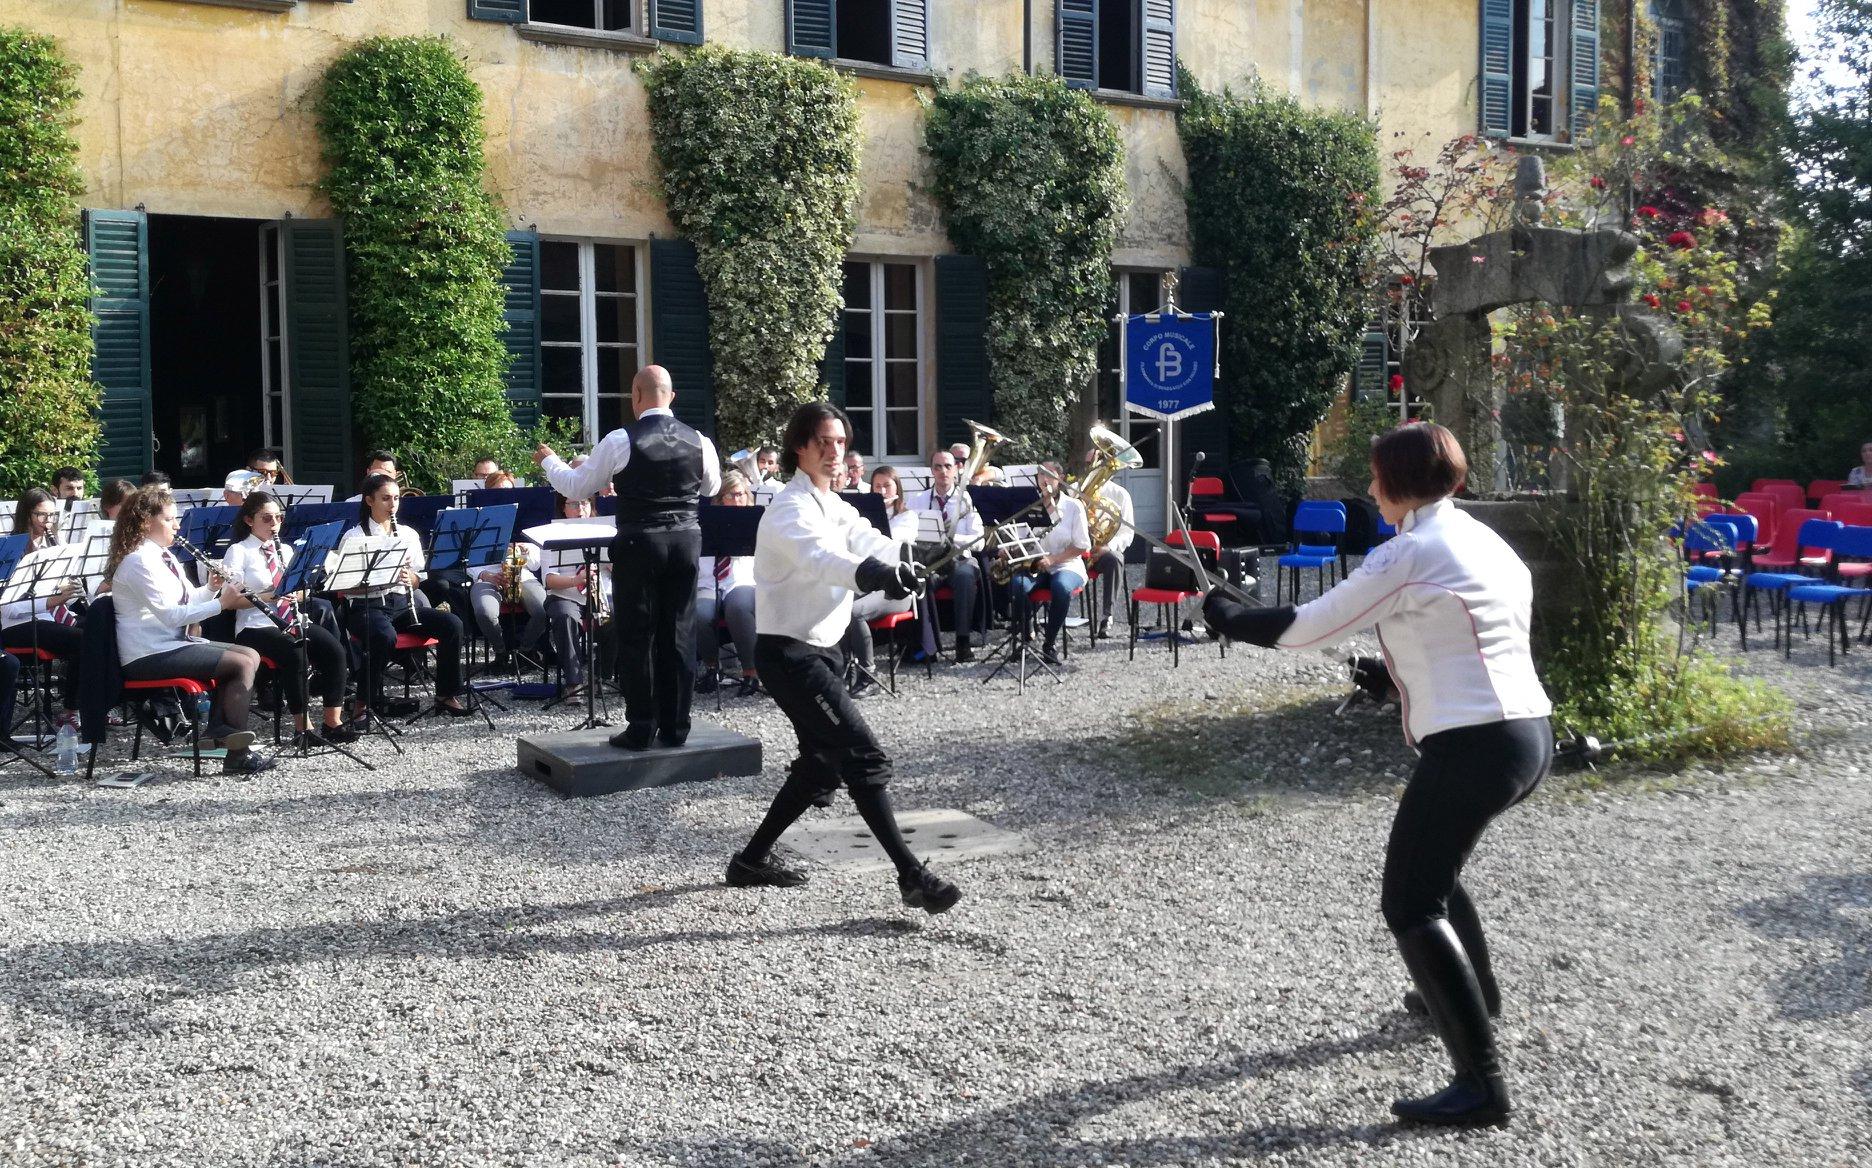 23 set 17 - Aperitivo & Musica in Villa Reina - Ars Gladii 04